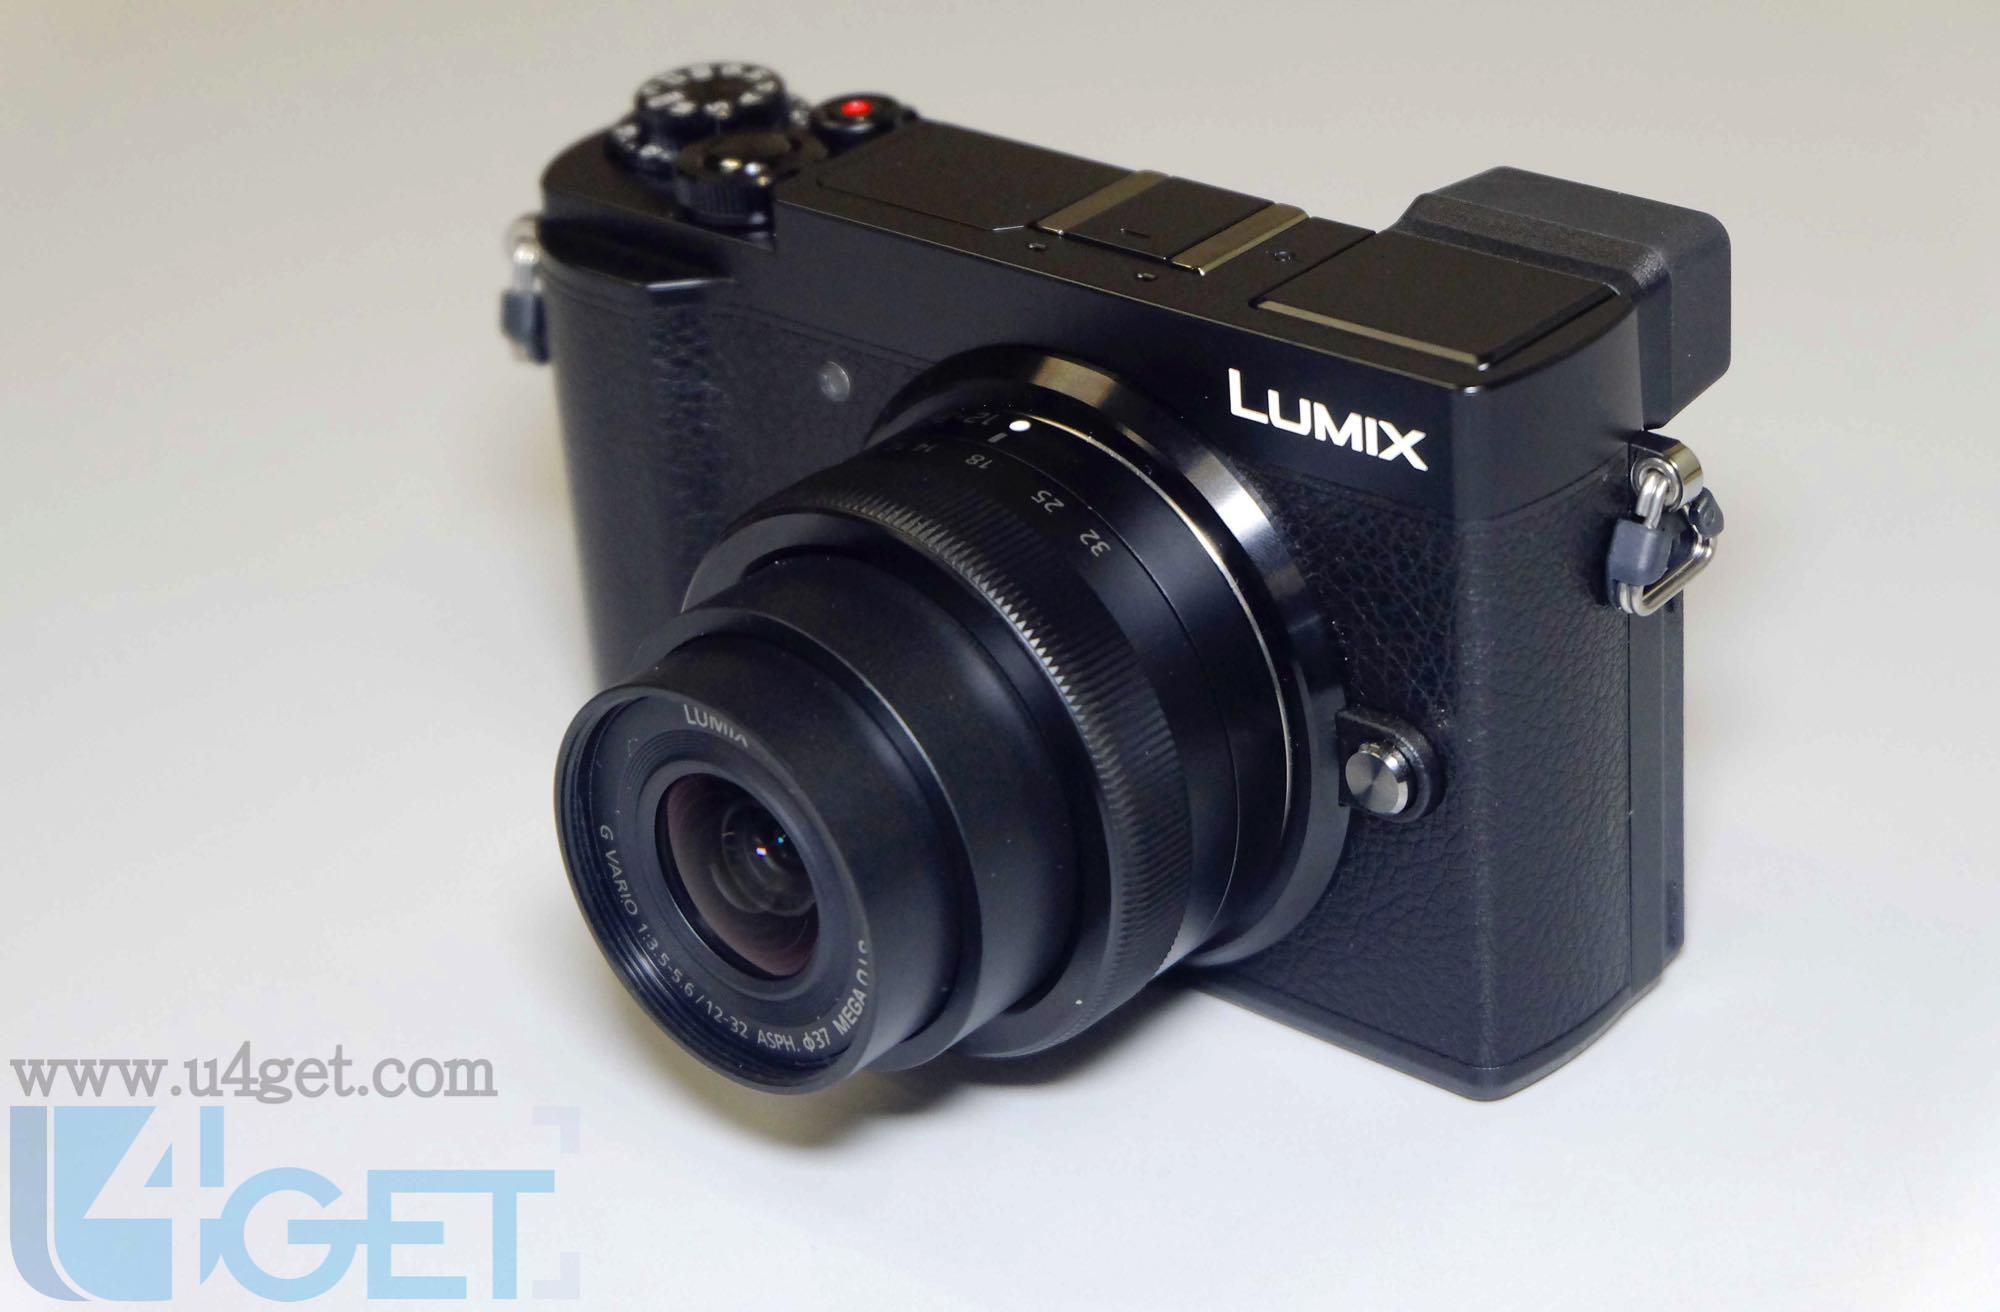 Panasonic LUMIX GX9 同步現身  4K 疊影加入黑白模式更多創意